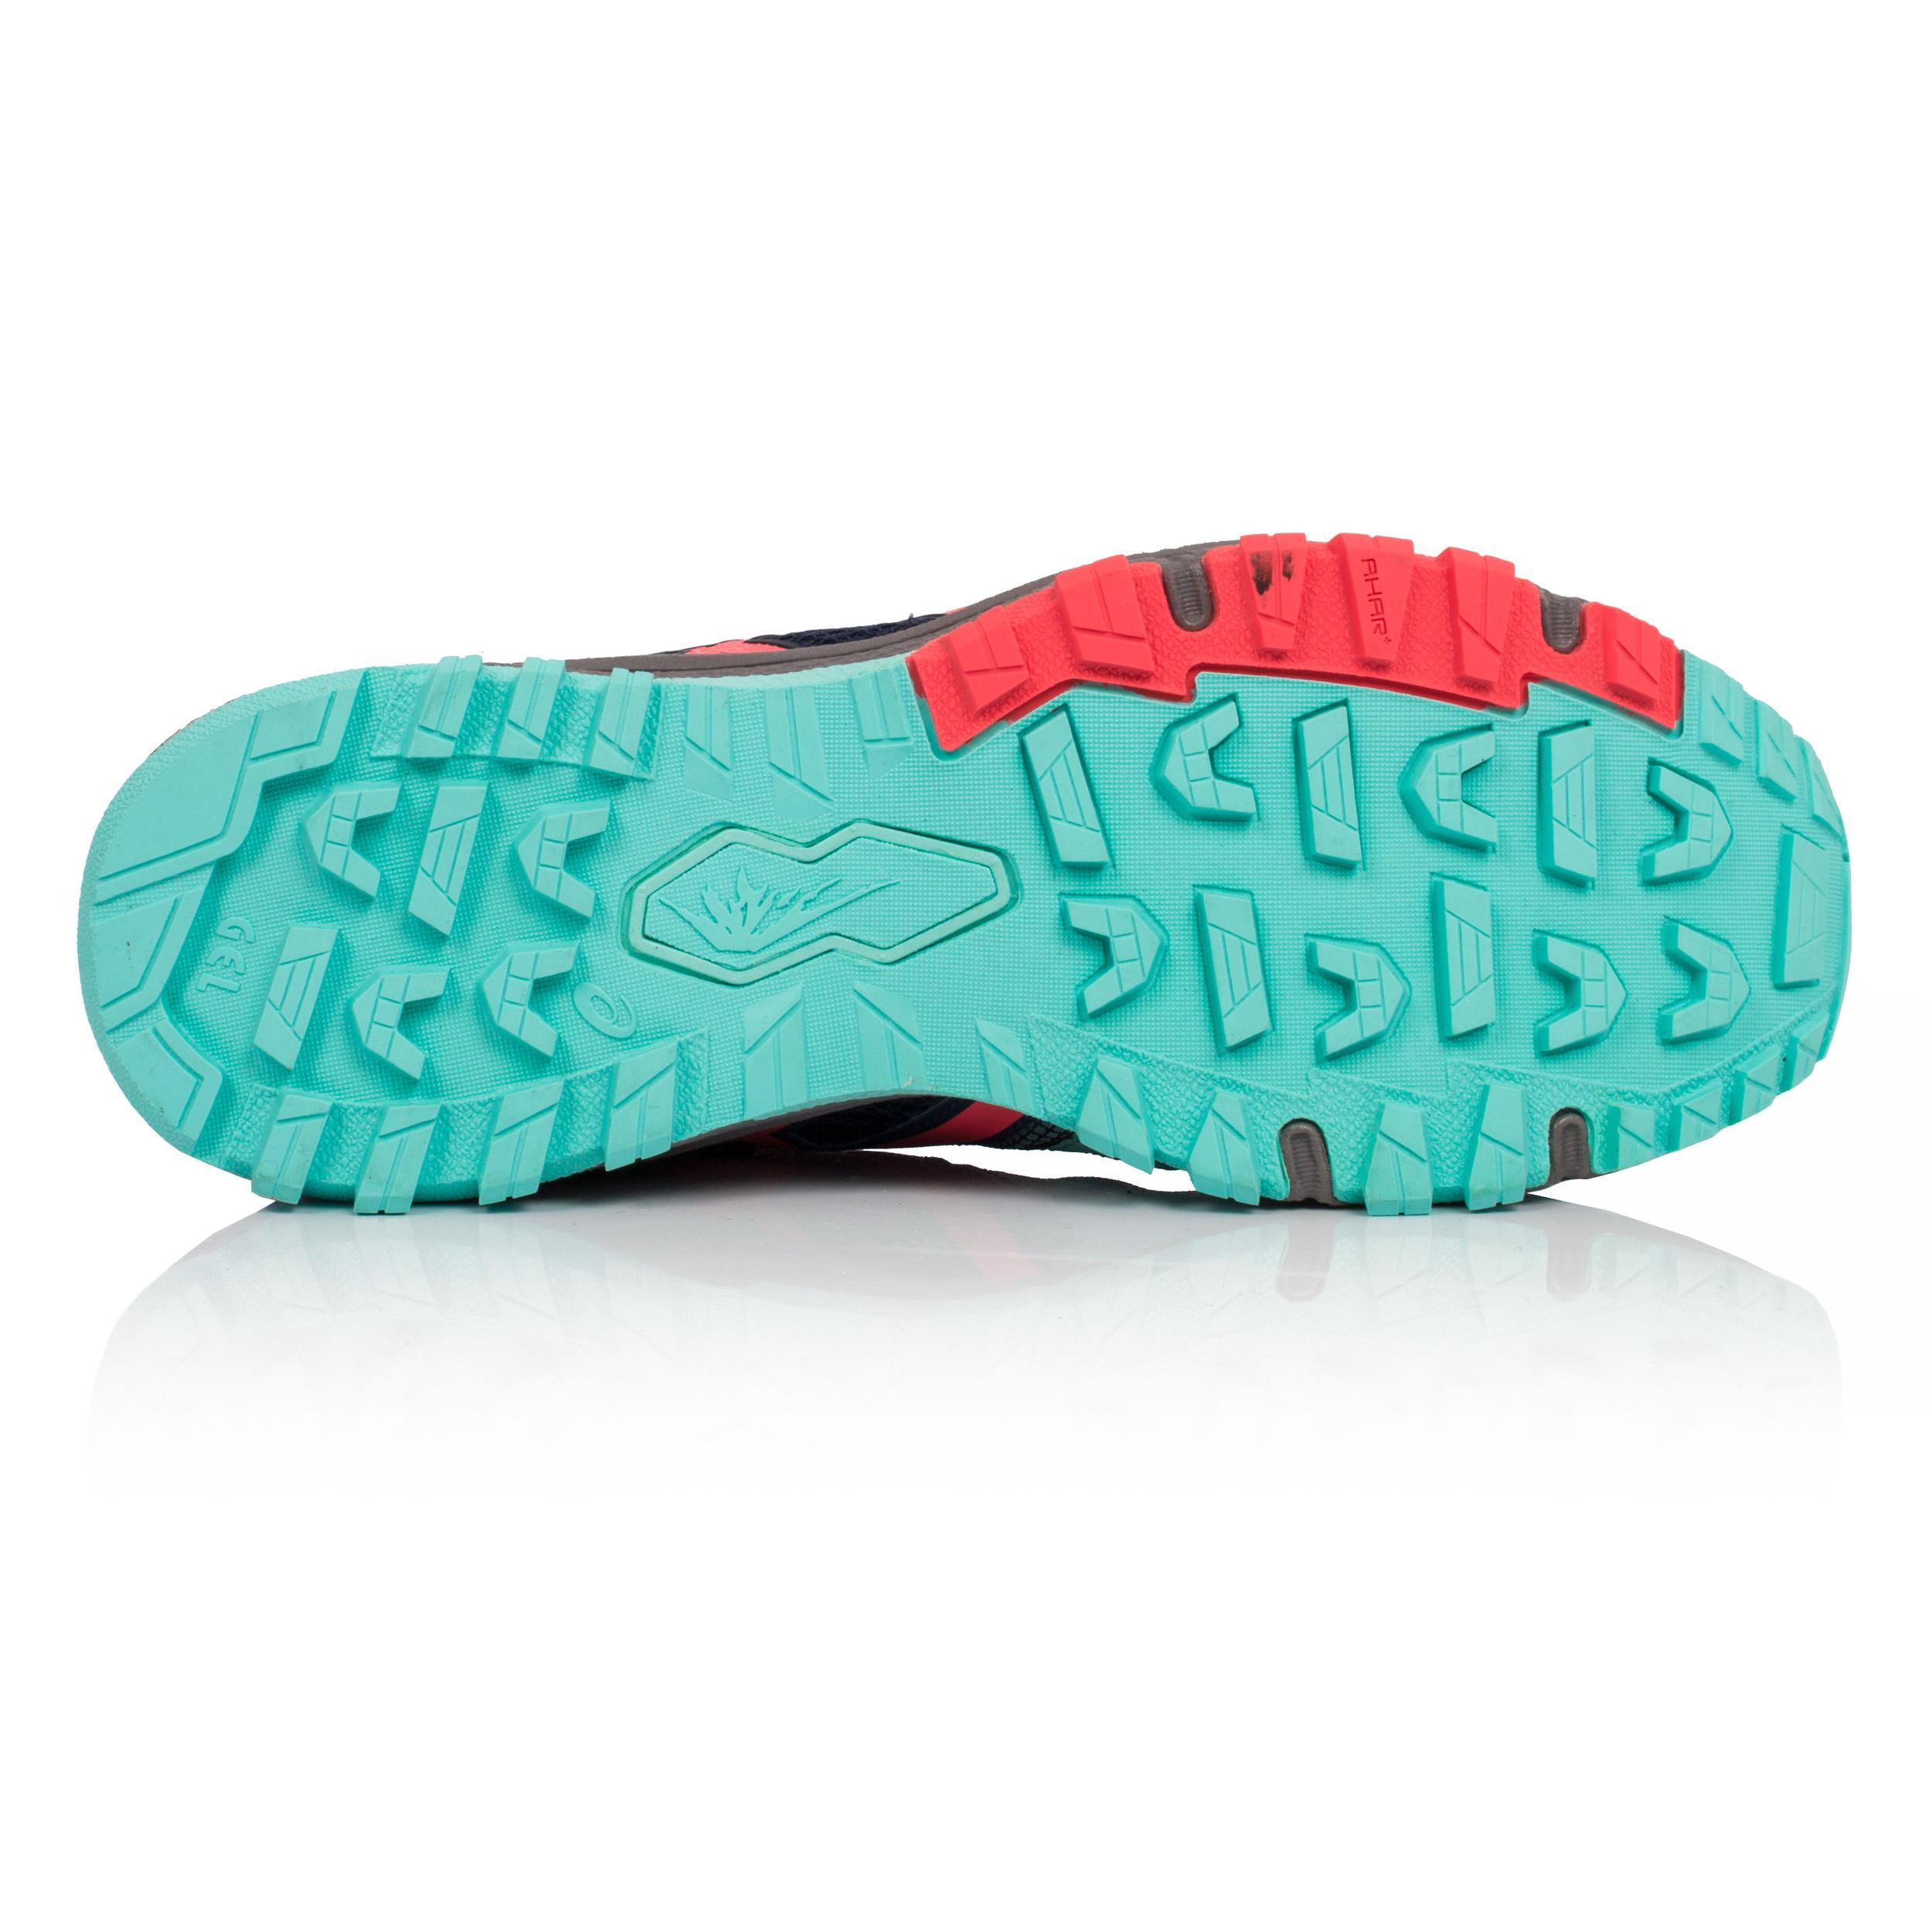 a2473945265 Asics Gel Fujiattack 5 Mujeres Negro Zapatillas Deportivas Trail Running  Correr